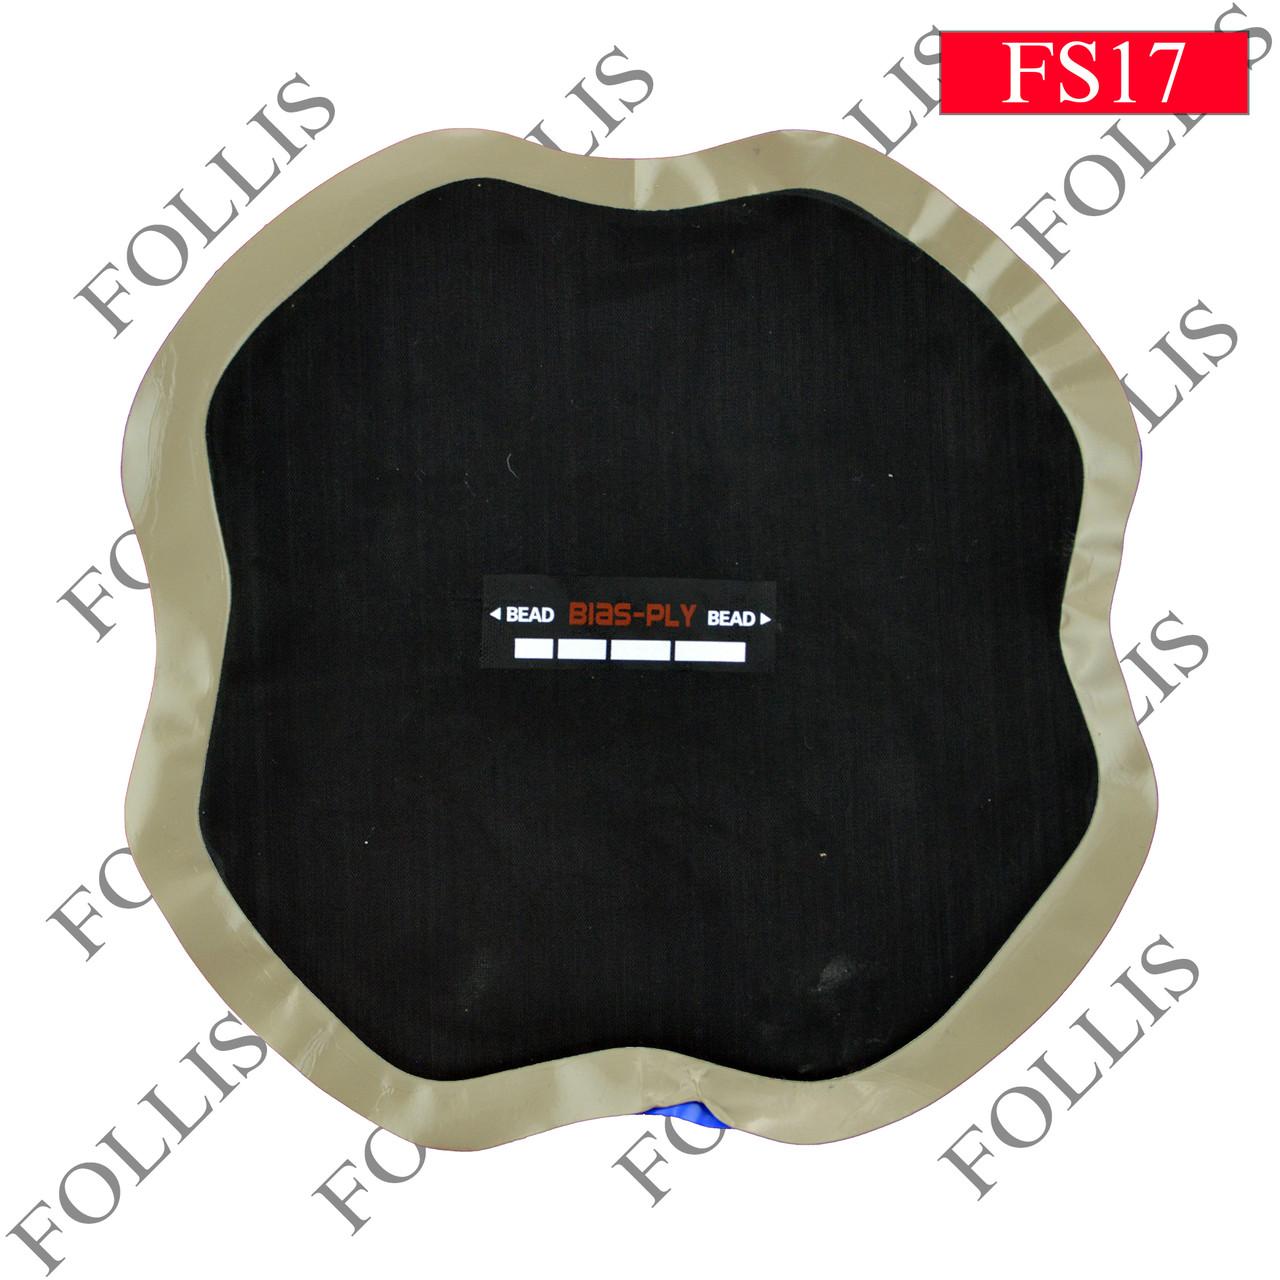 B-08 215mmX215mm Cord thread 4 ply